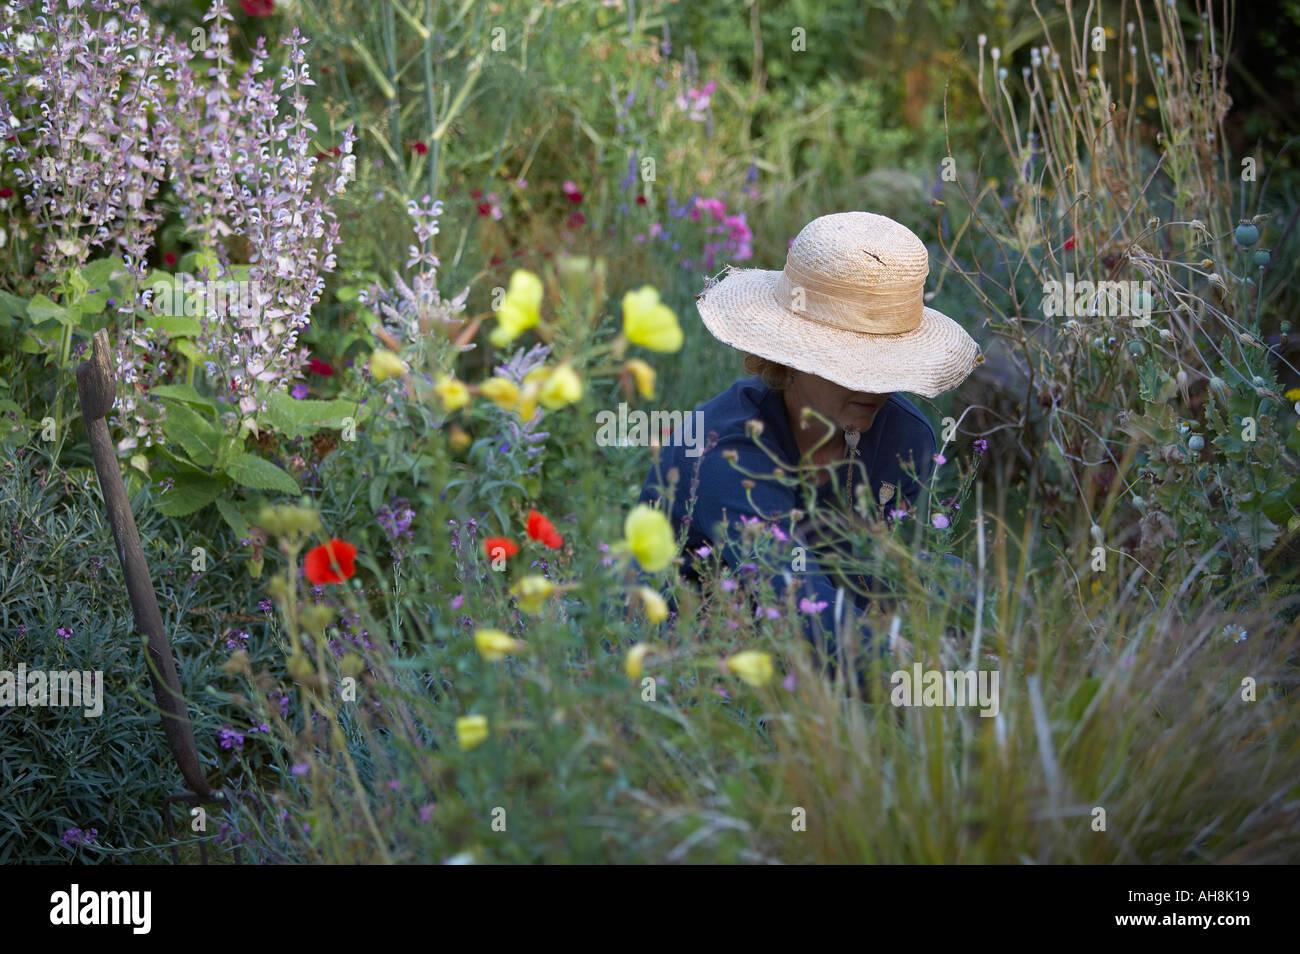 Woman gardening model released Dorset England UK - Stock Image